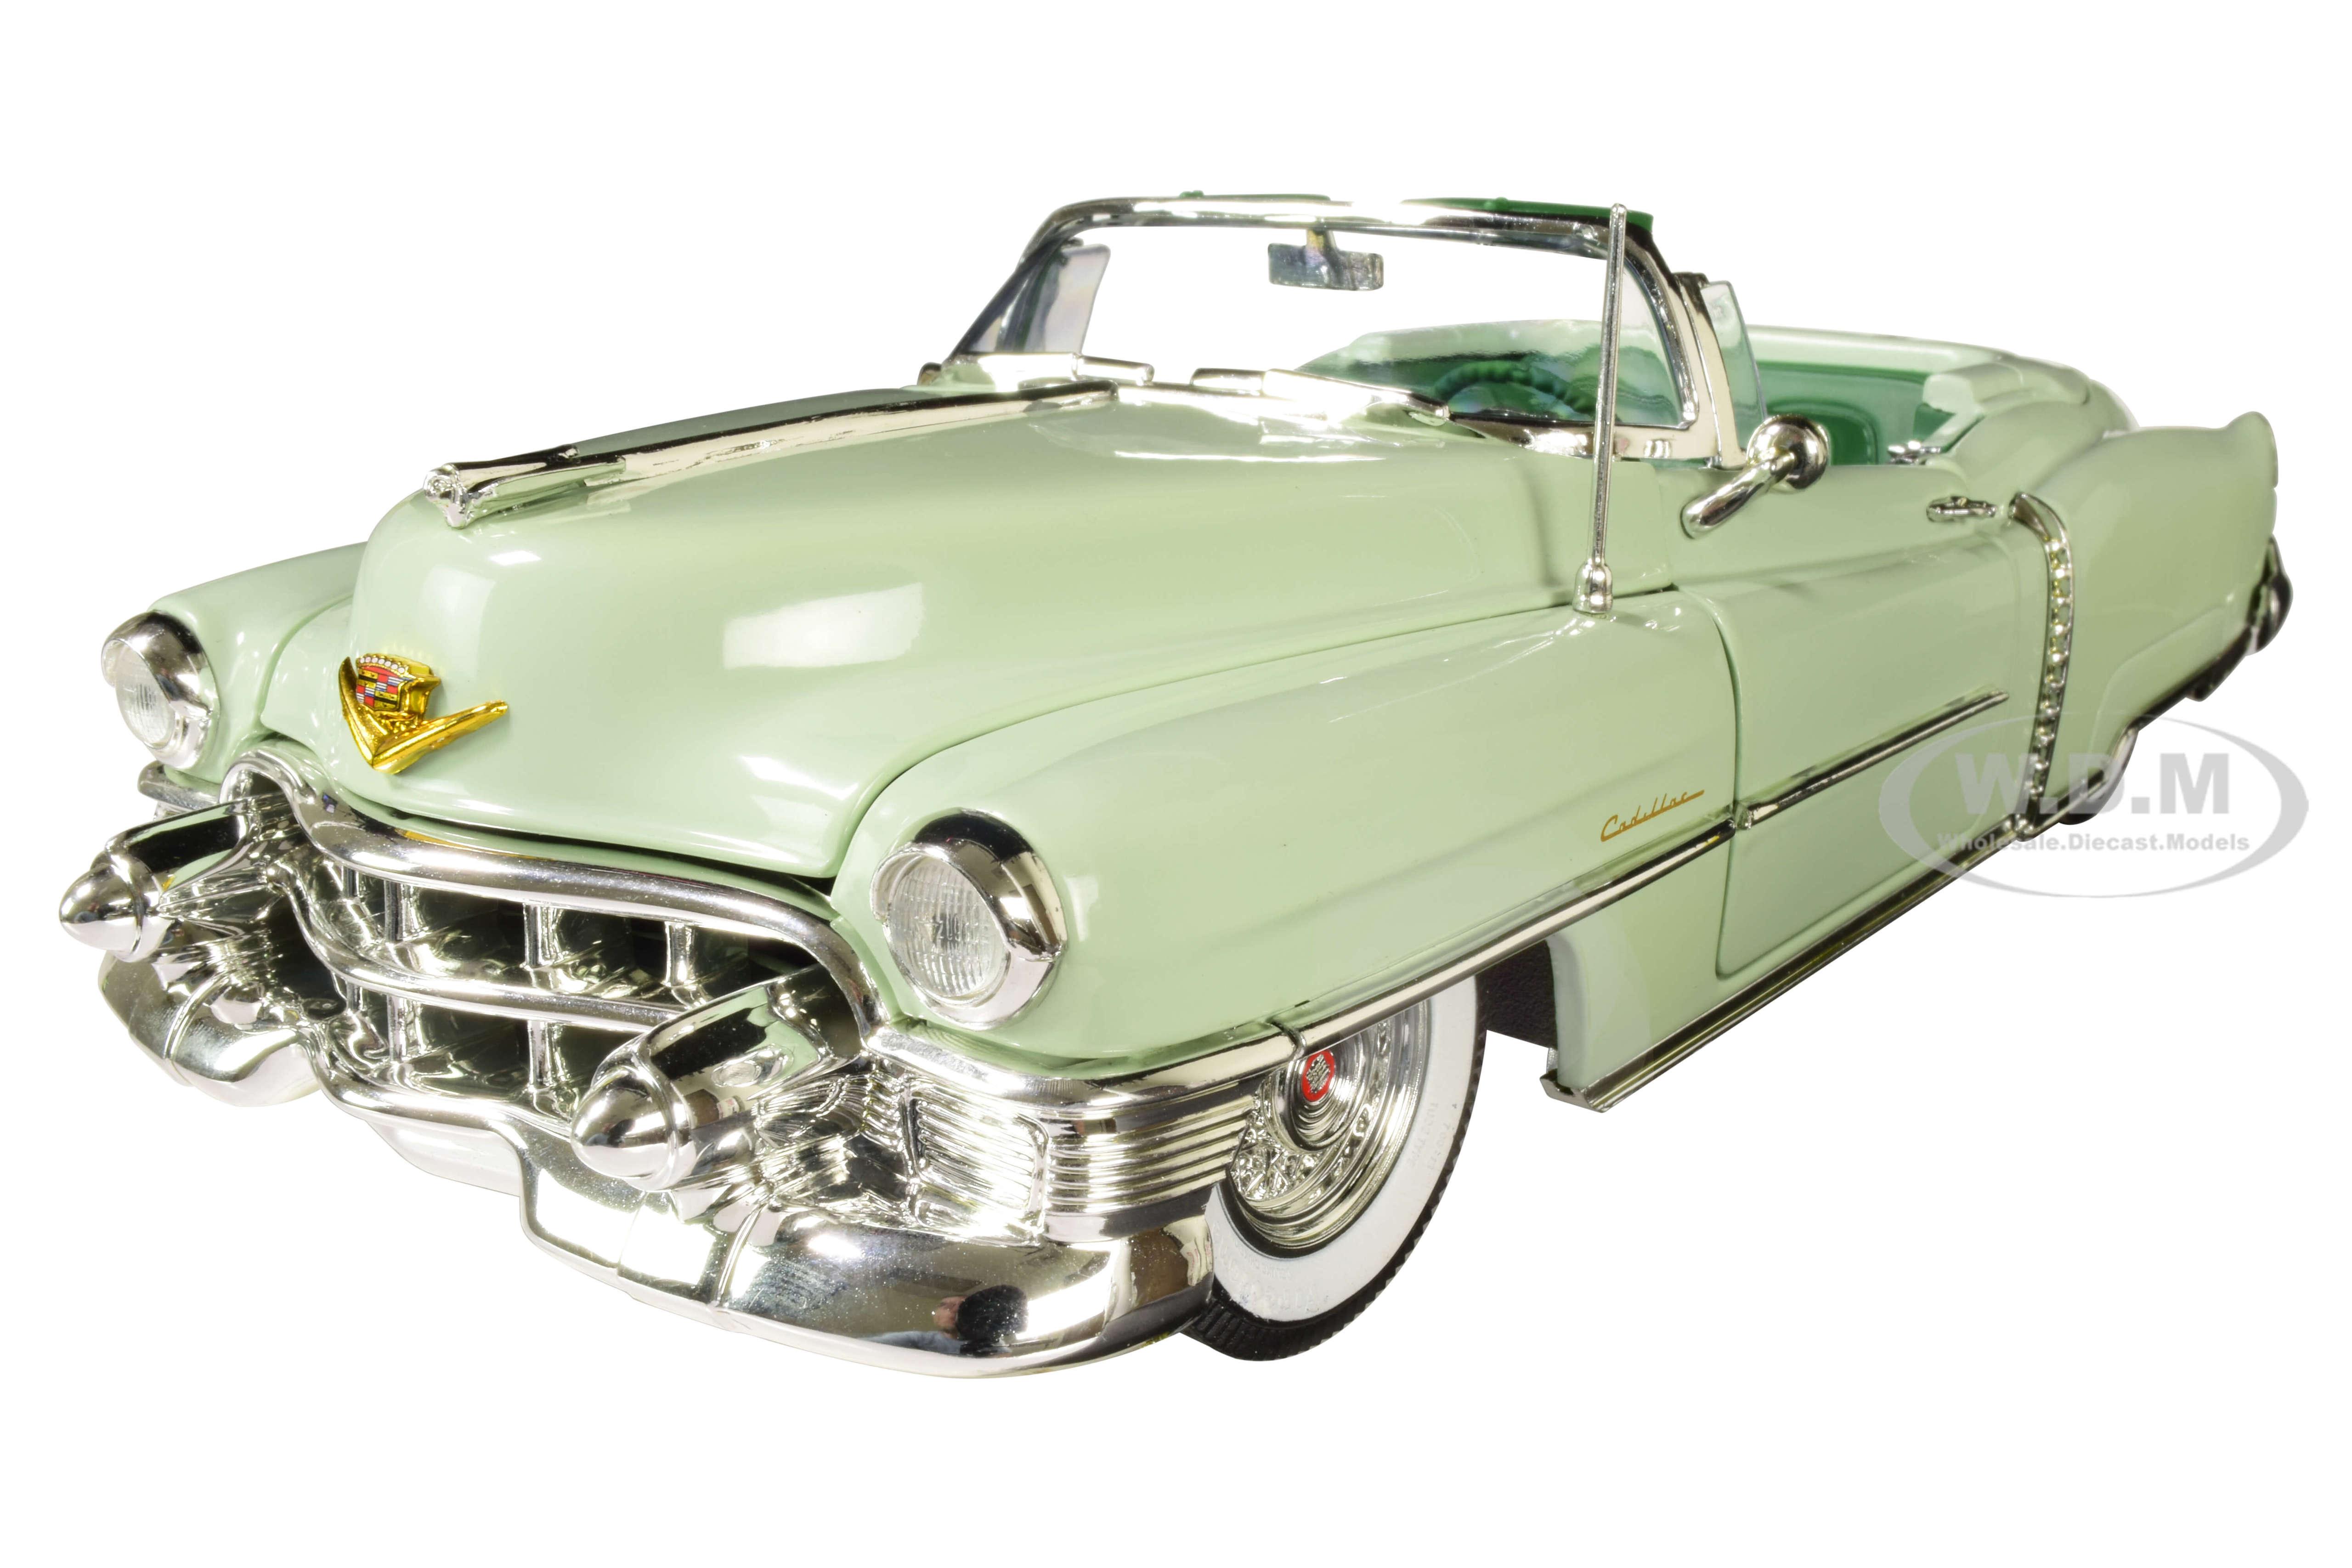 1953 Cadillac Eldorado Convertible Gloss Light Green with Dark Green Interior 1/18 Diecast Model Car by Autoworld